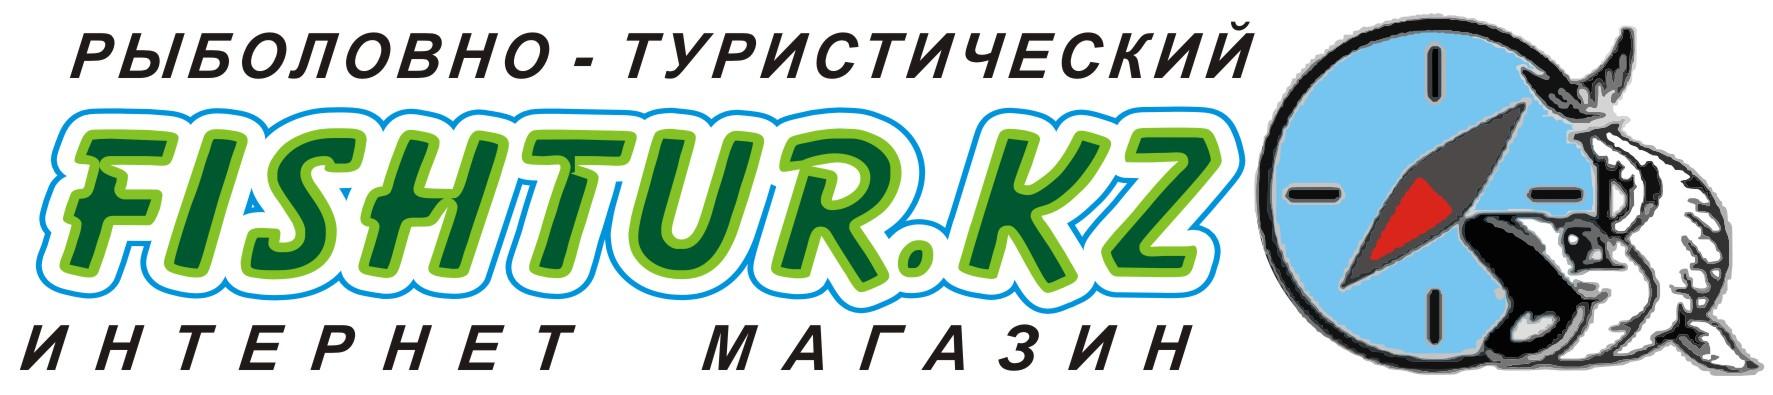 Интернет Магазин FISHTUR.KZ Рыбалка и Туризм